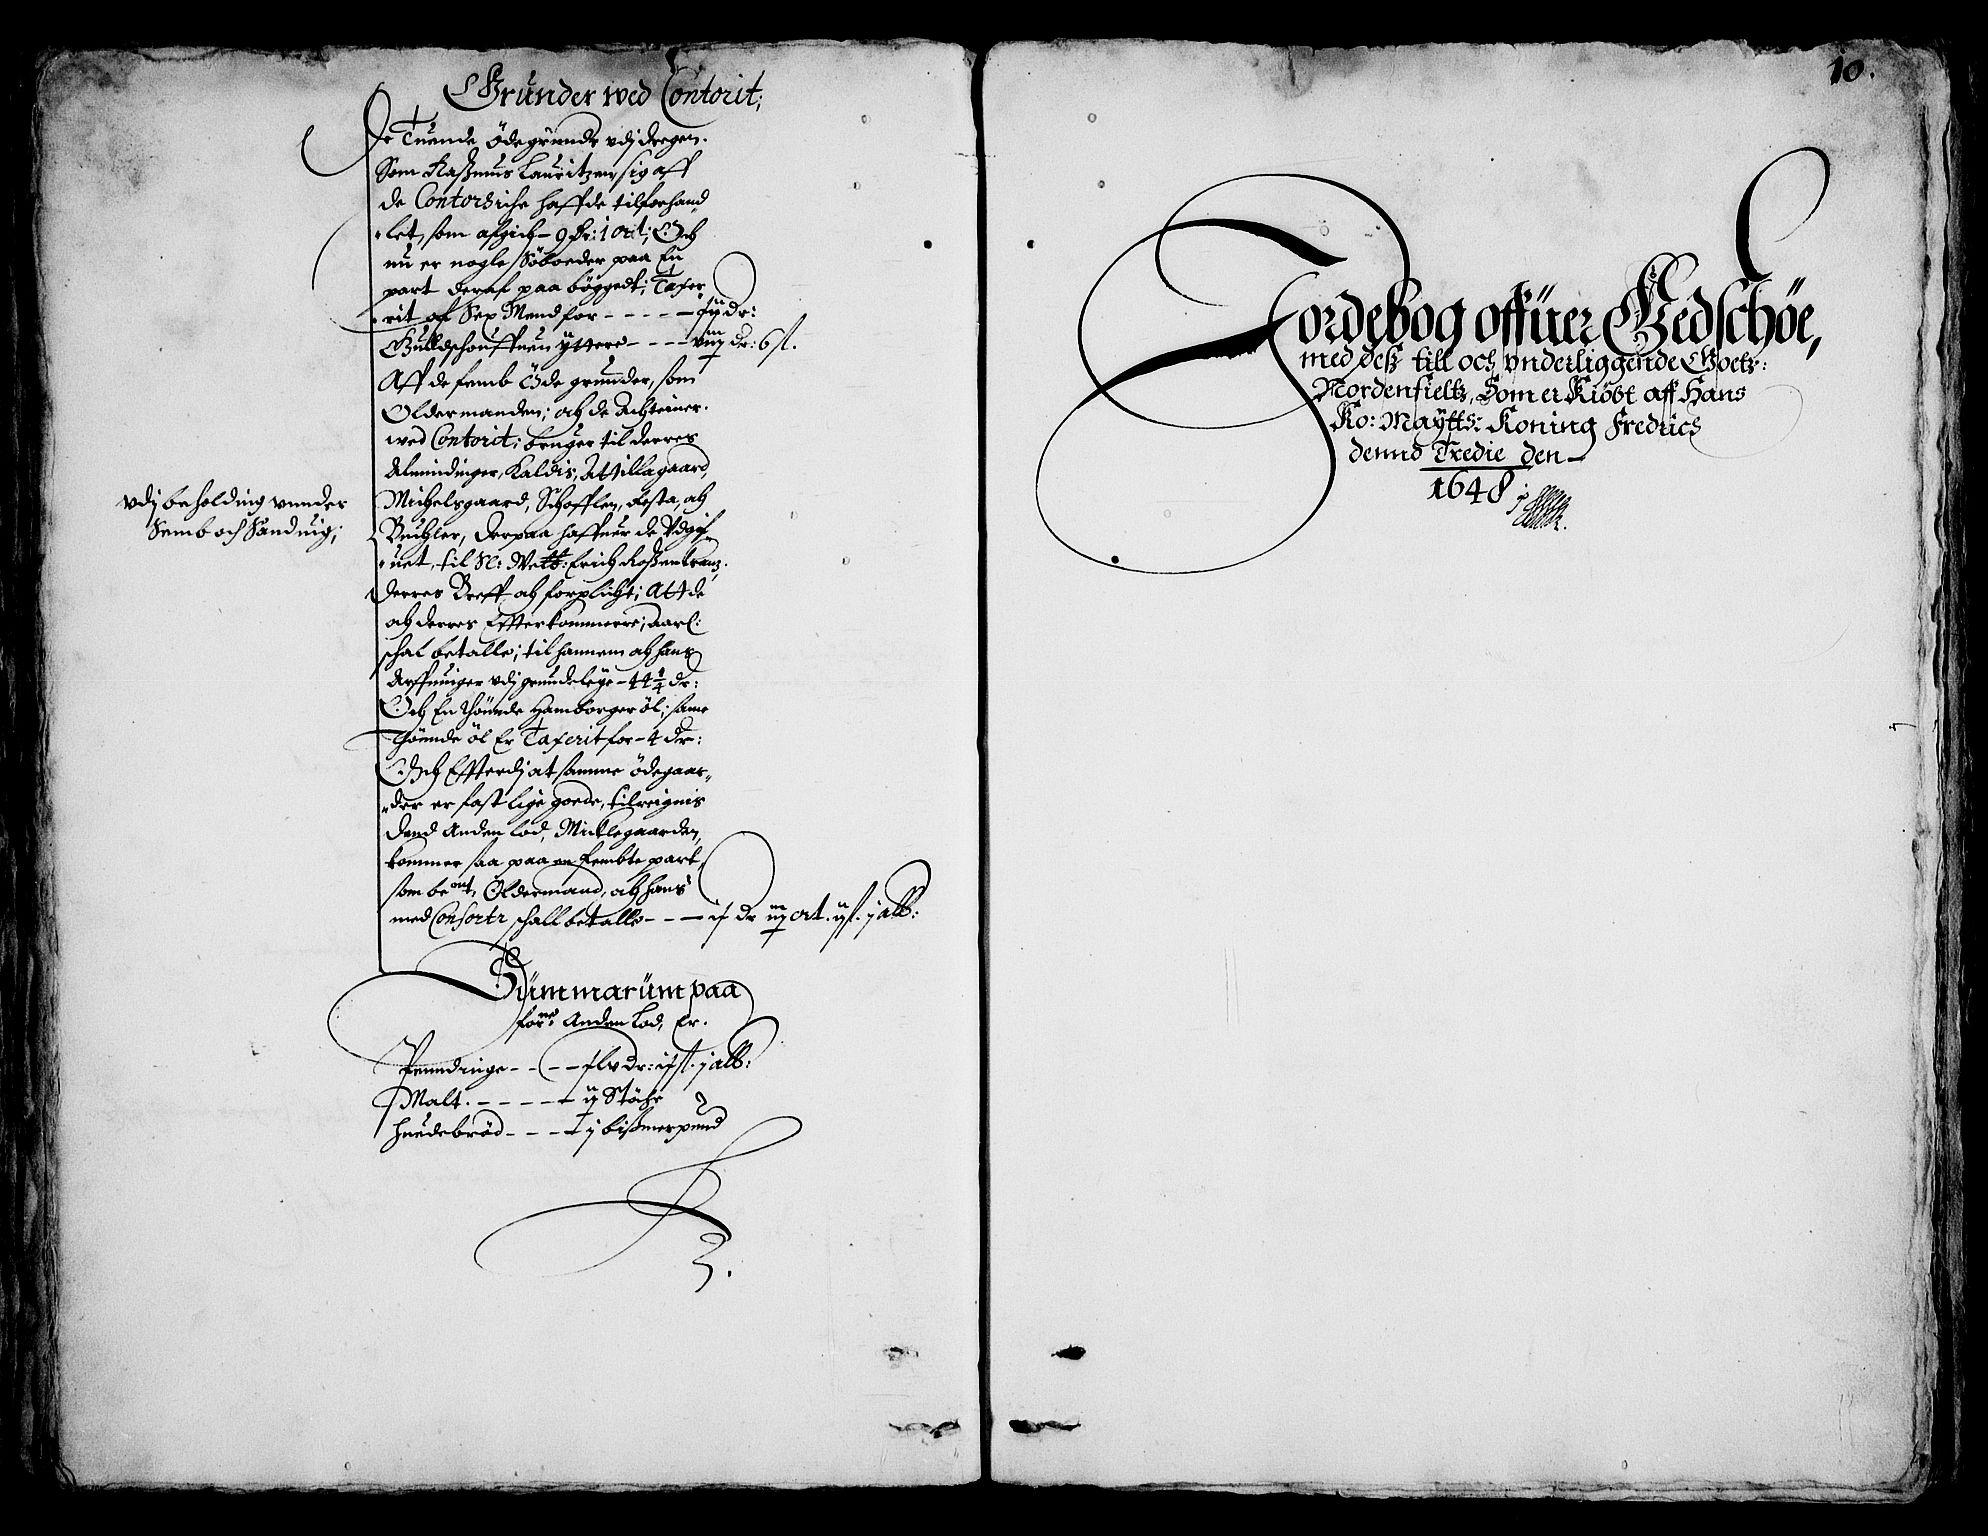 RA, Rentekammeret inntil 1814, Realistisk ordnet avdeling, On/L0001: Statens gods, 1651, s. 1009b-1010a